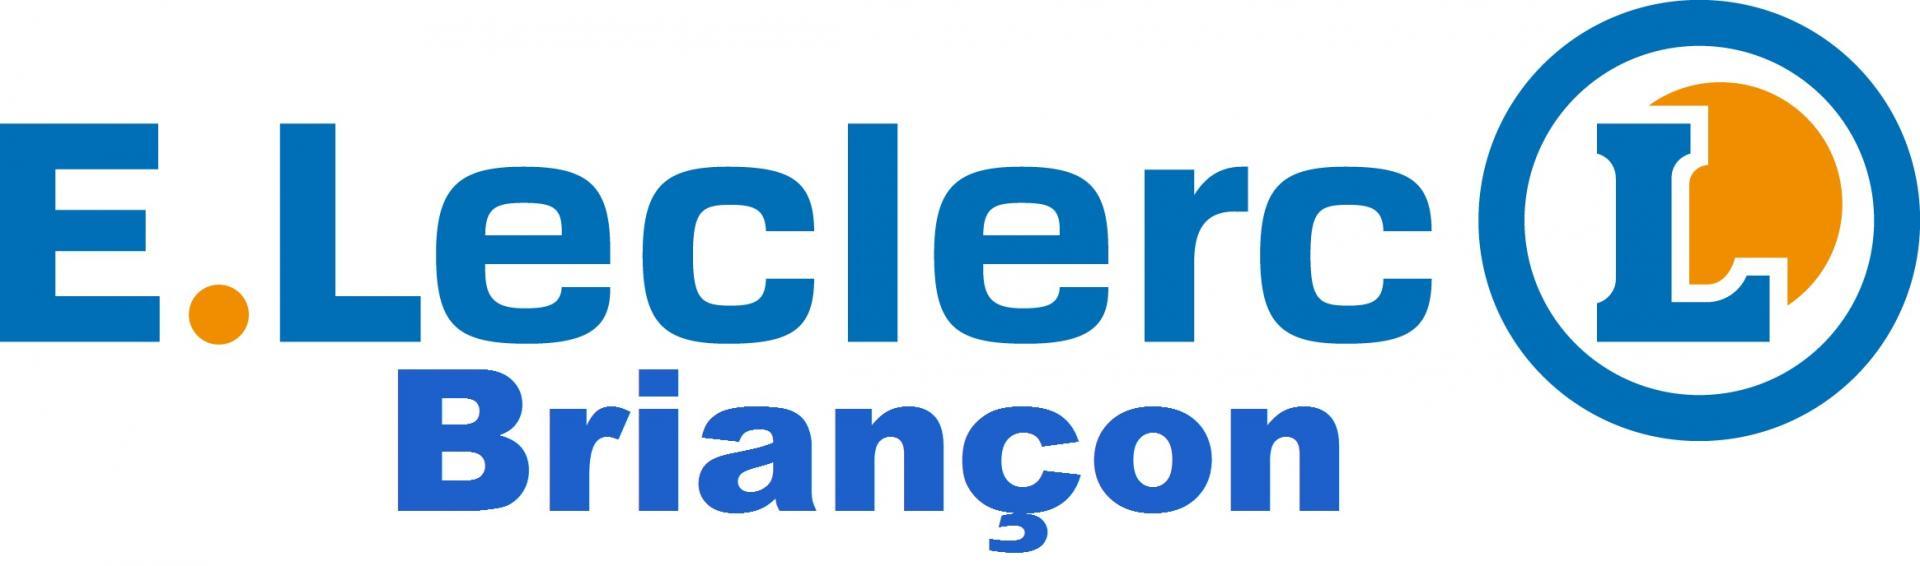 Logo leclerc briancon